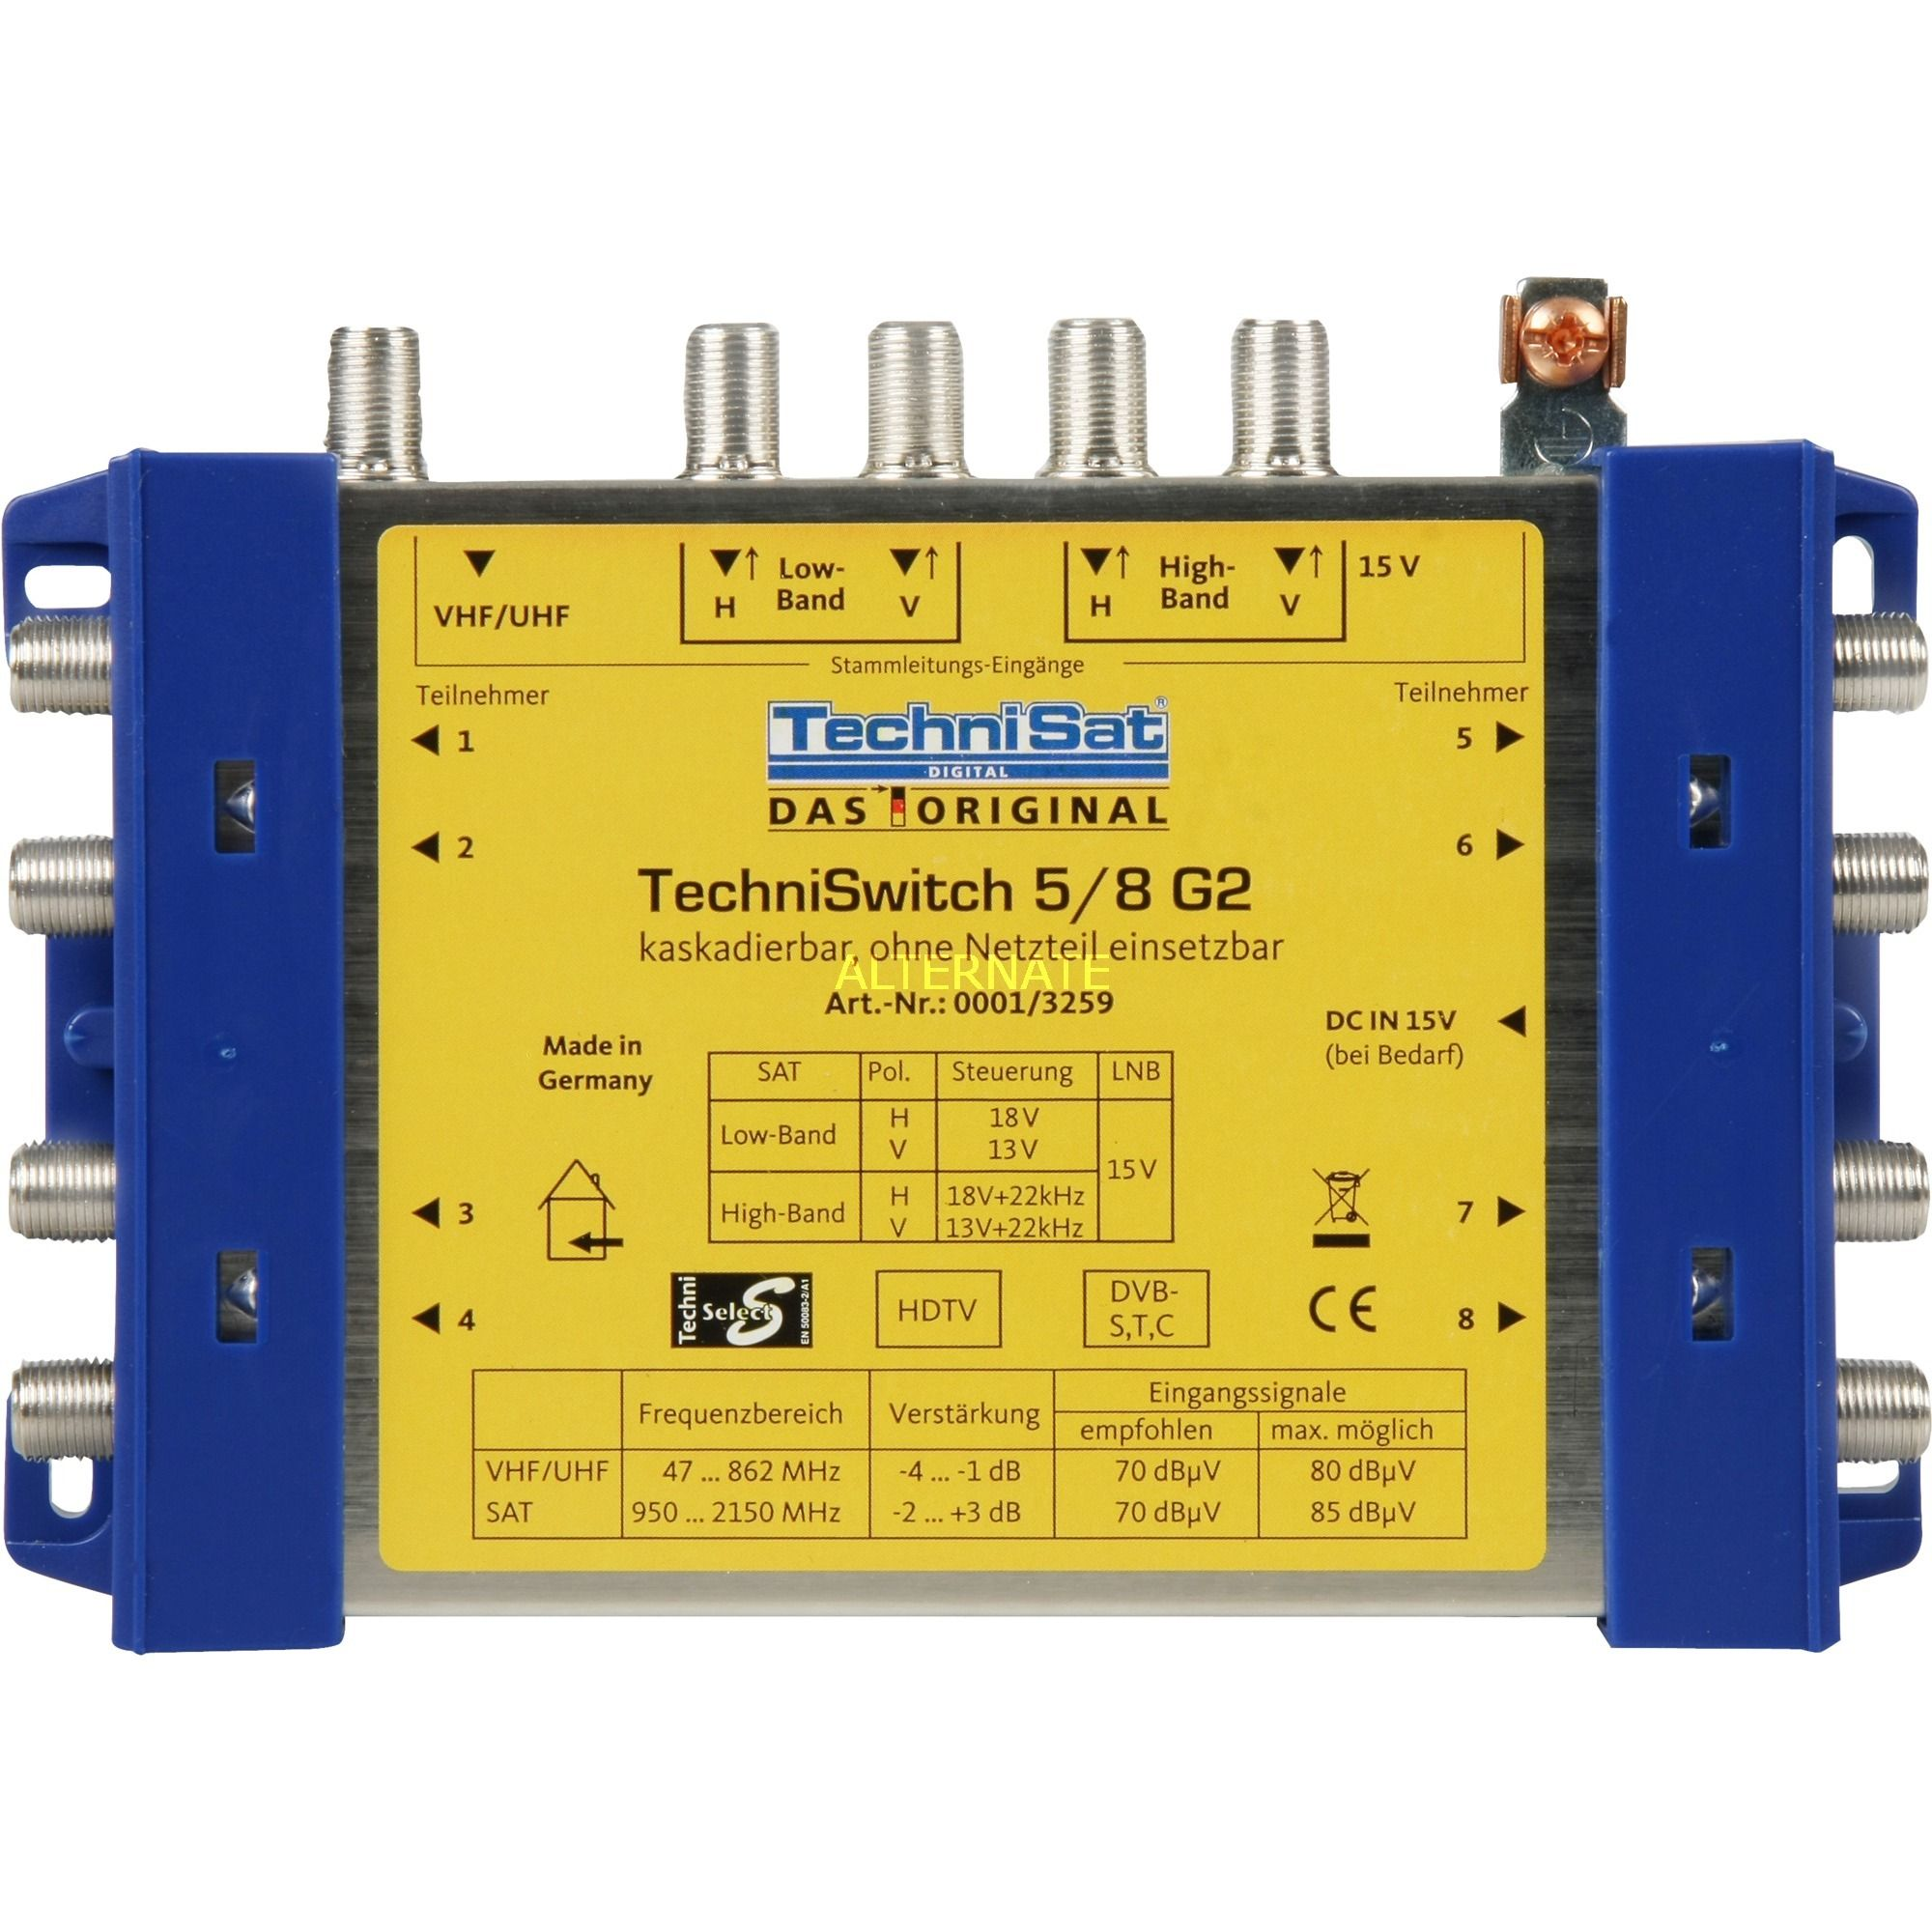 Hd Dvr Tuner Card Antenne Tnt Portable Usb Antenne Tv Hd Tnt Adaptateur Tnt Hd Enregistreur Double Tuner Antenne Par Antenne Tnt Commutateur Antenne Tv